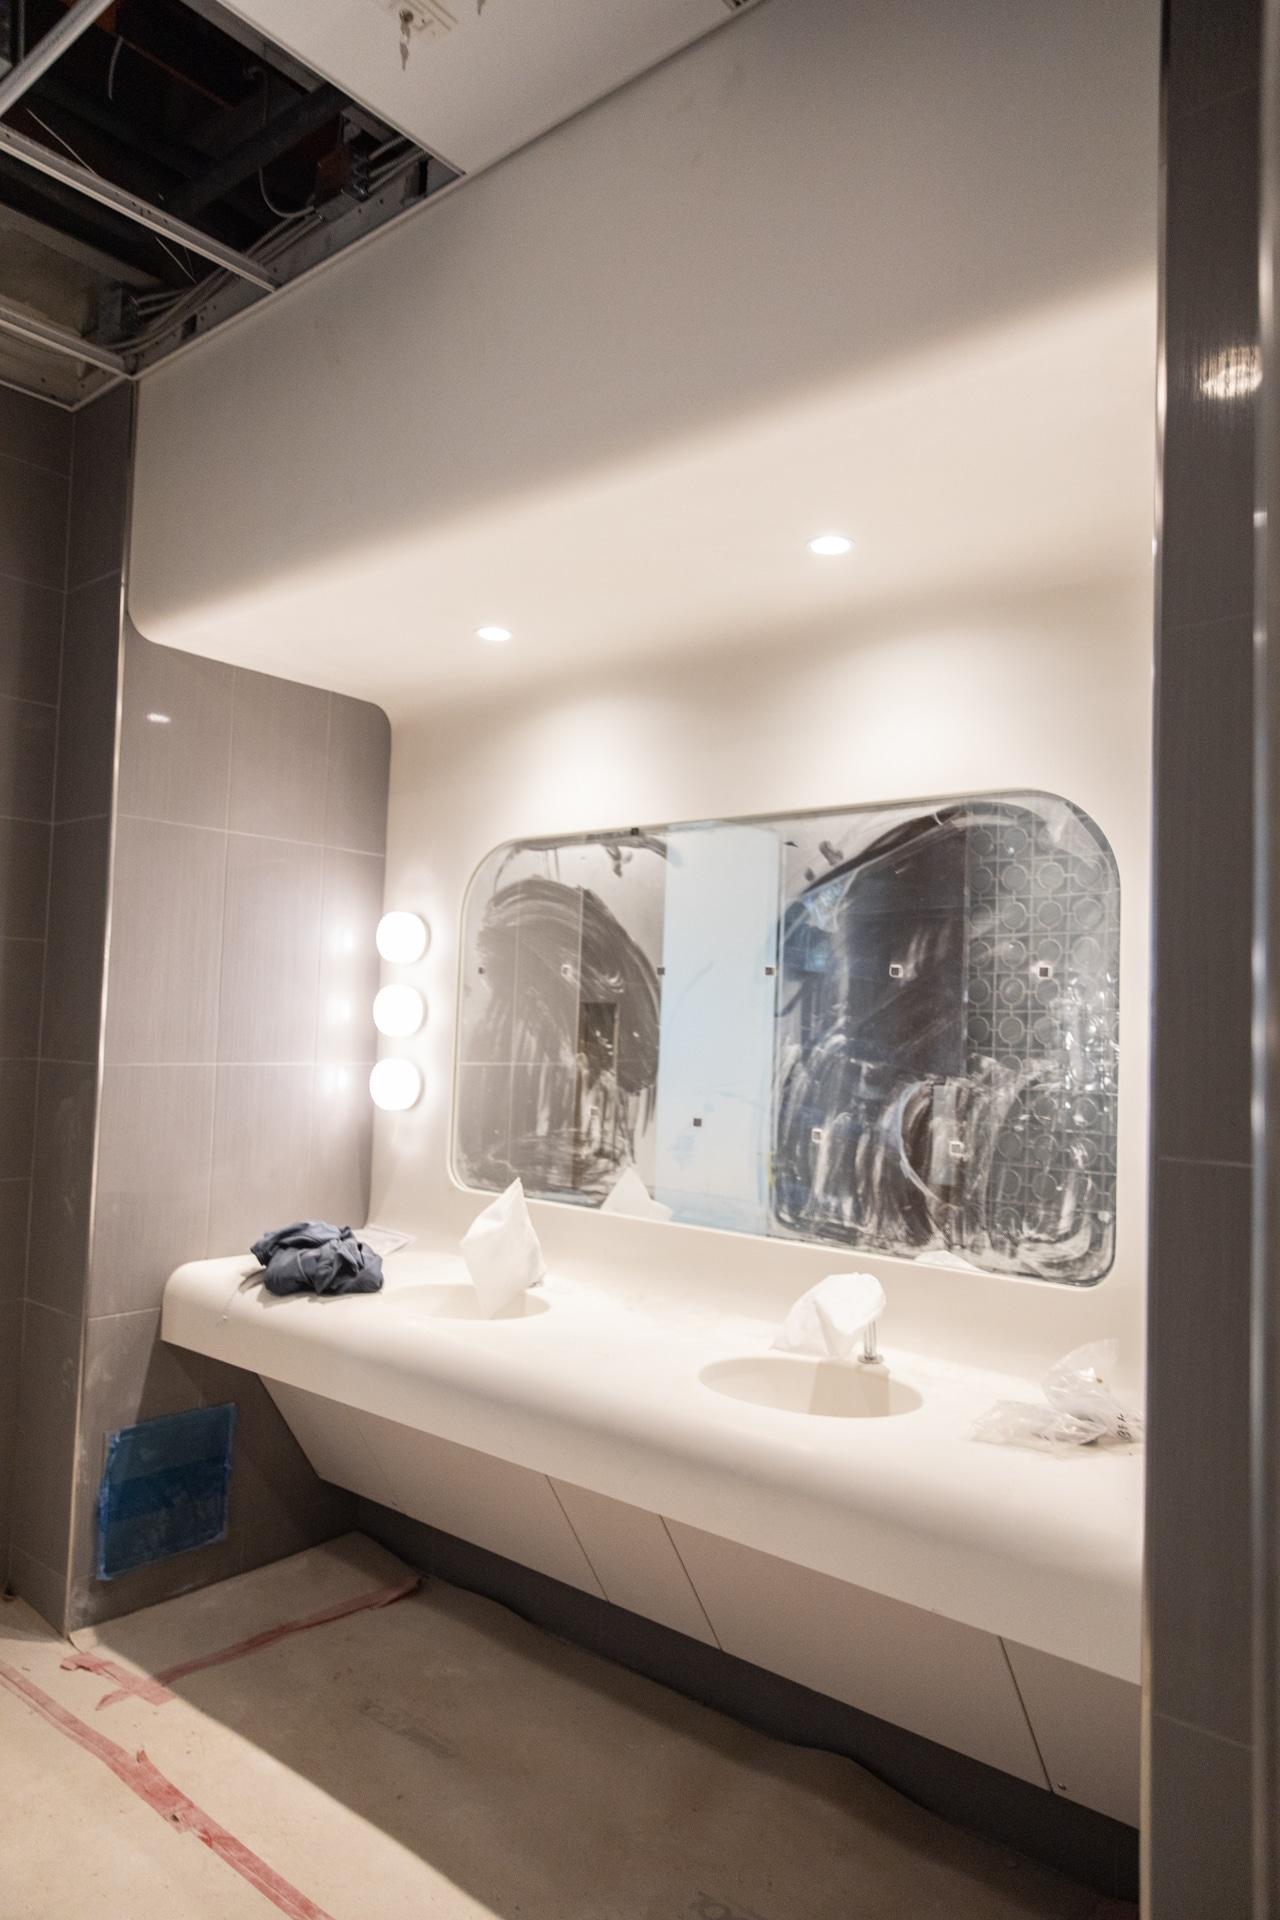 bathroom at the Greyhound building